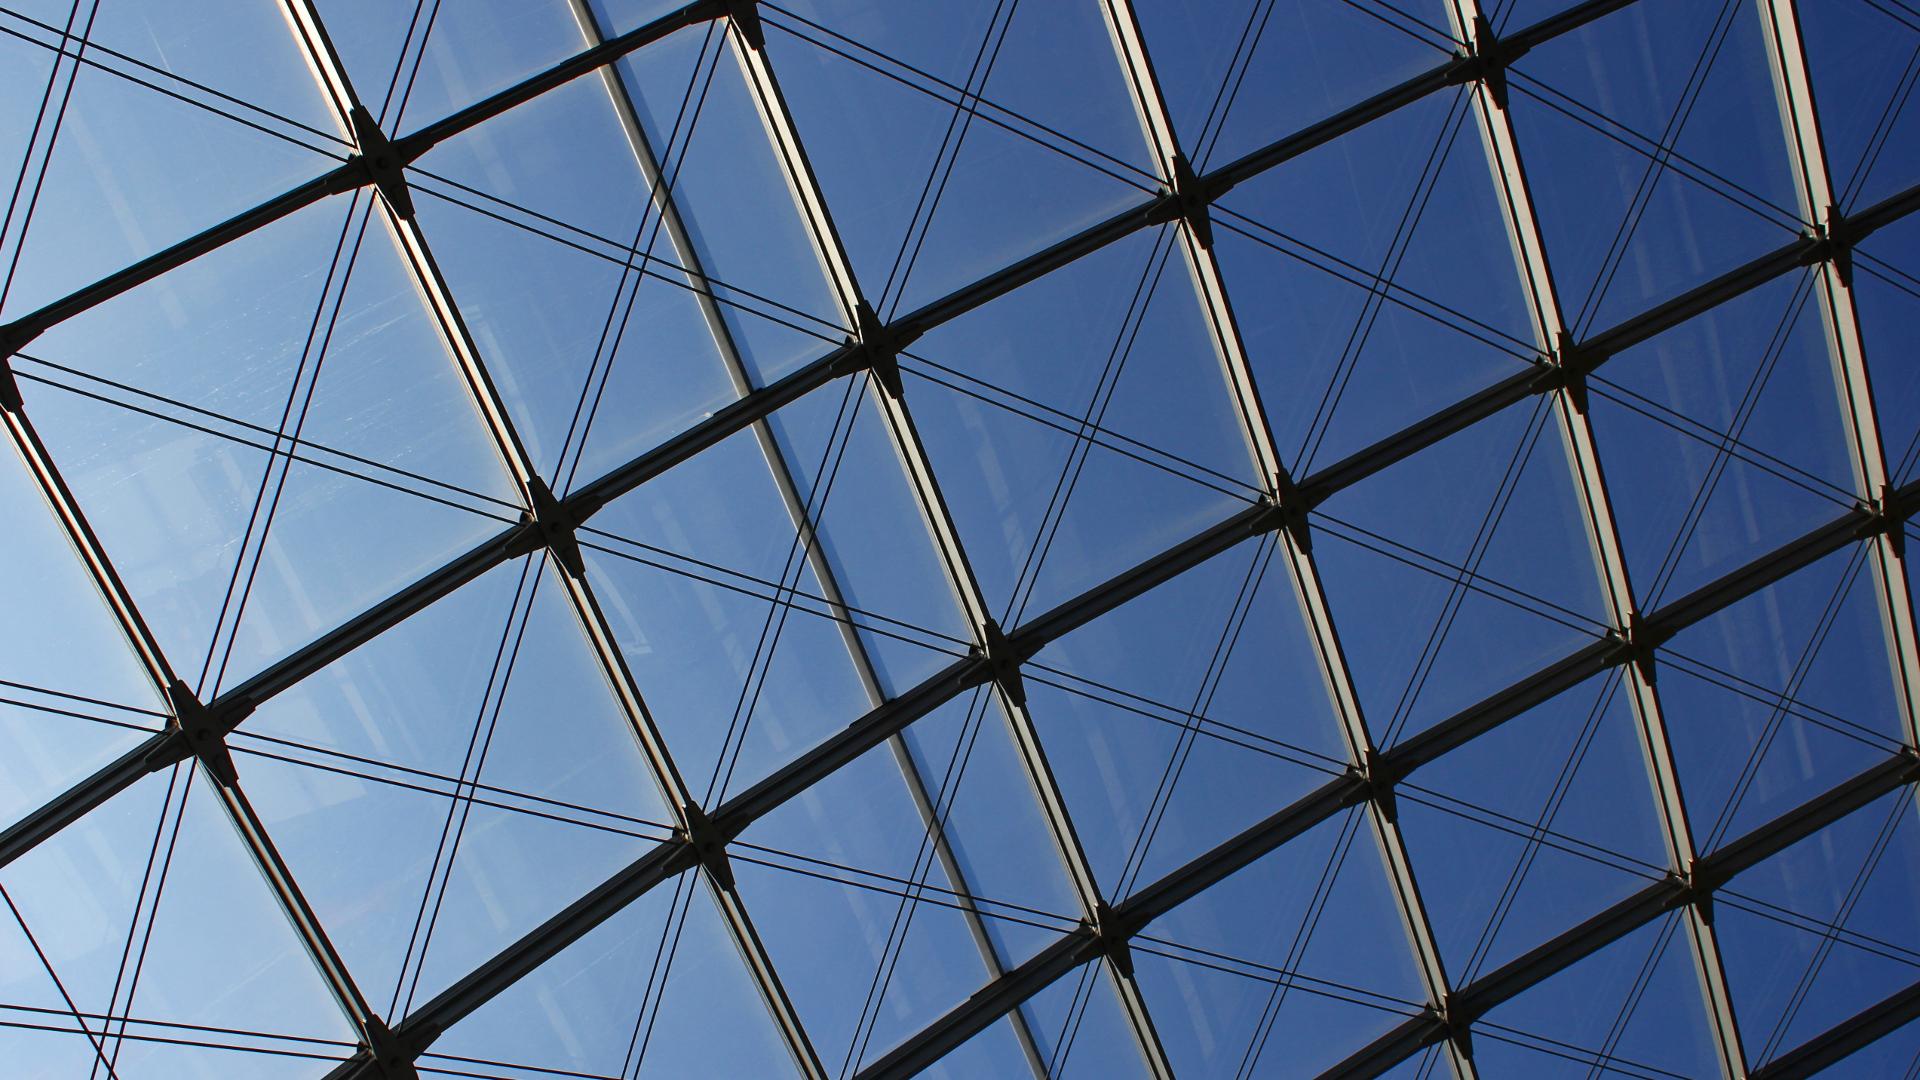 цельностеклянная крыша